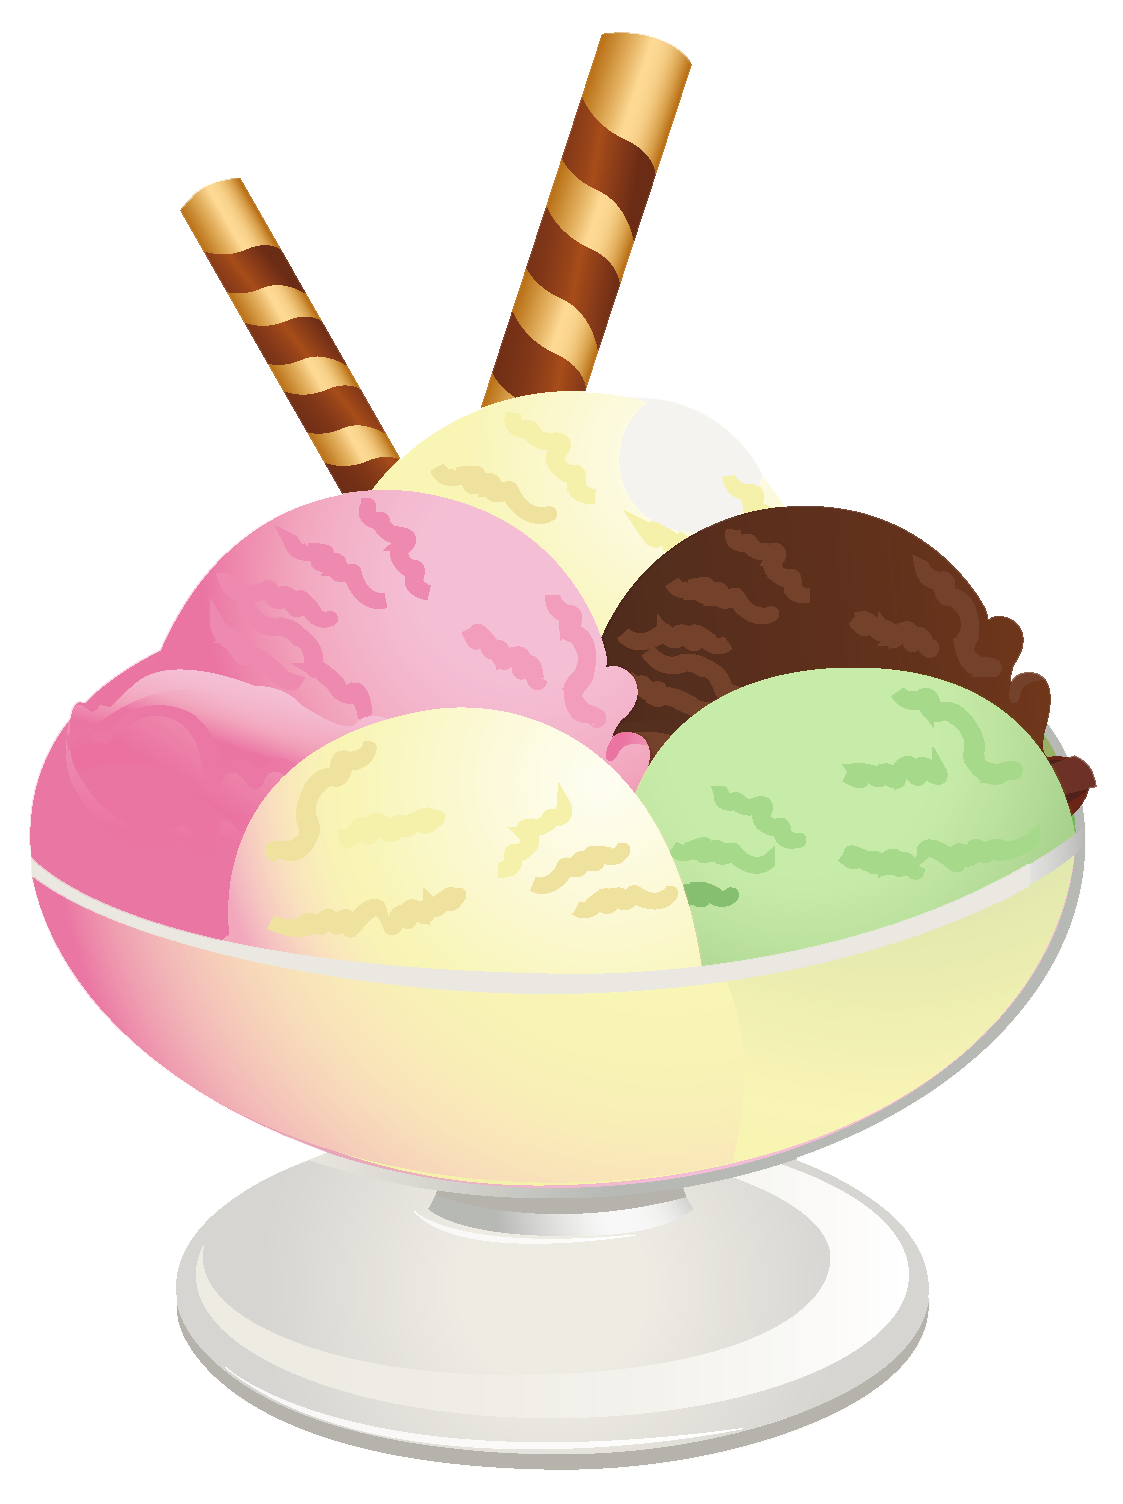 Ice cream sundae clipart cliparts